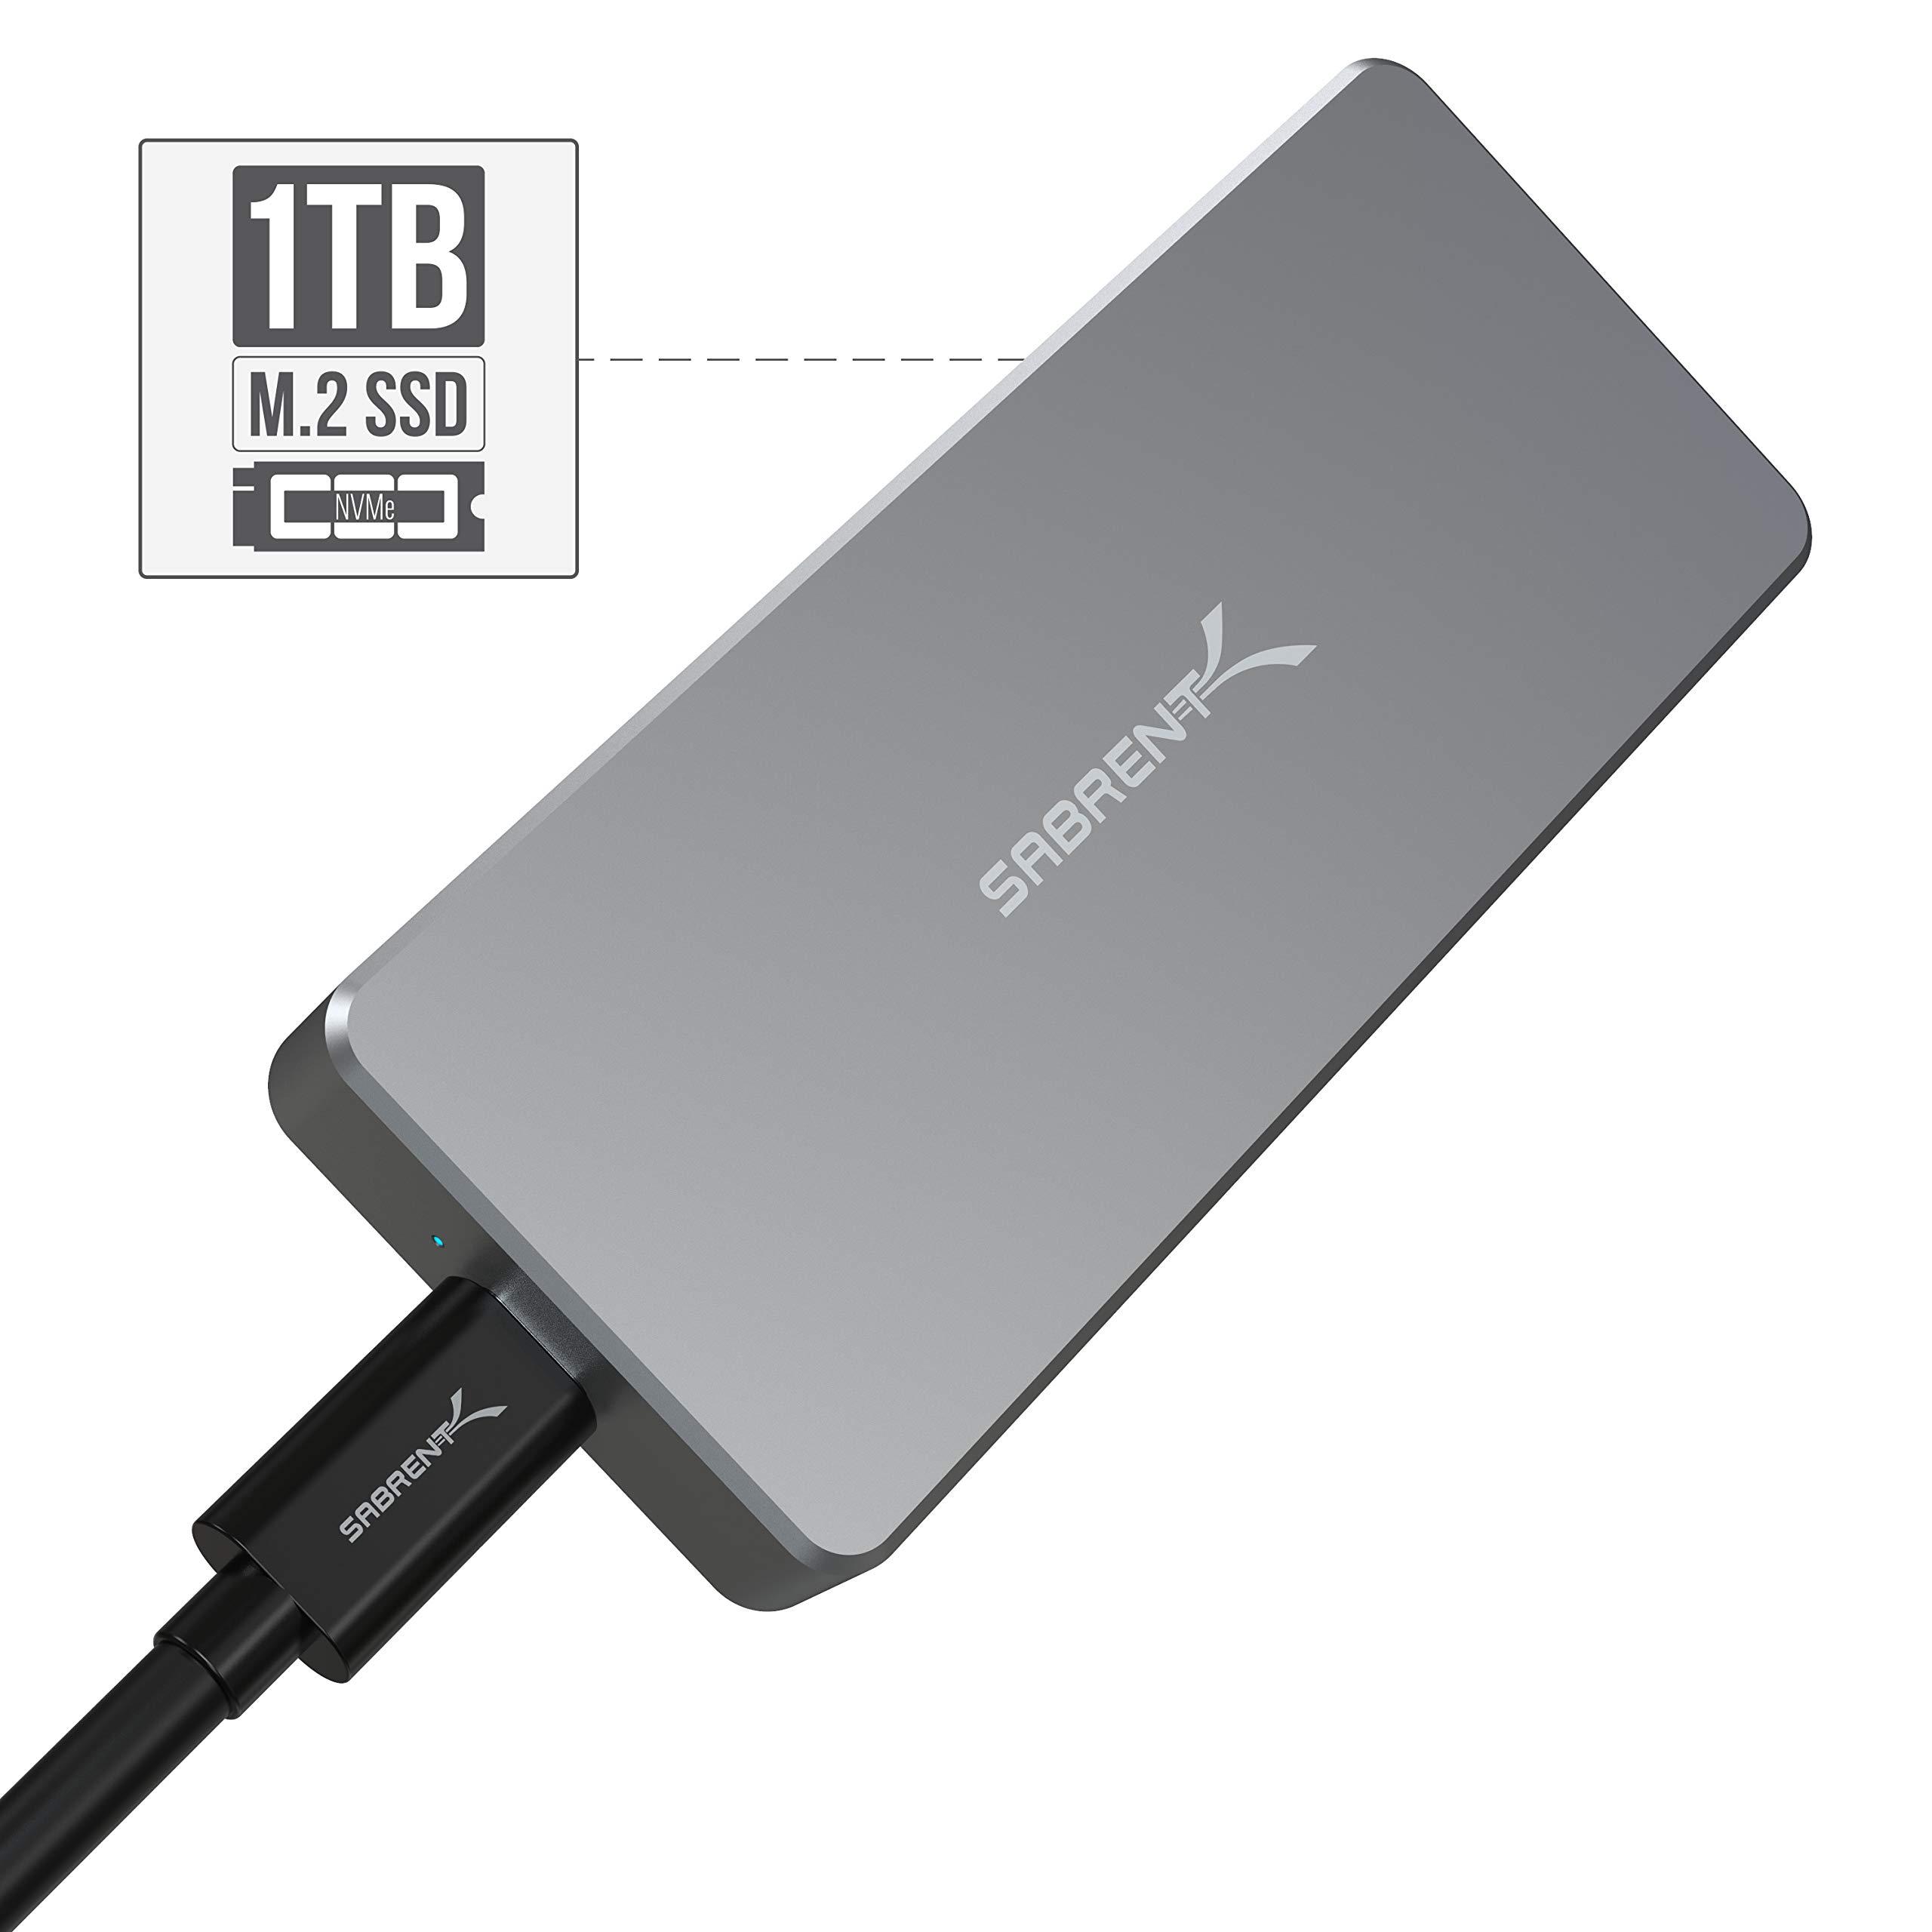 Sabrent Rocket Pro 1TB NVMe USB 3.1 External Aluminum SSD (SB-1TB-NVME)